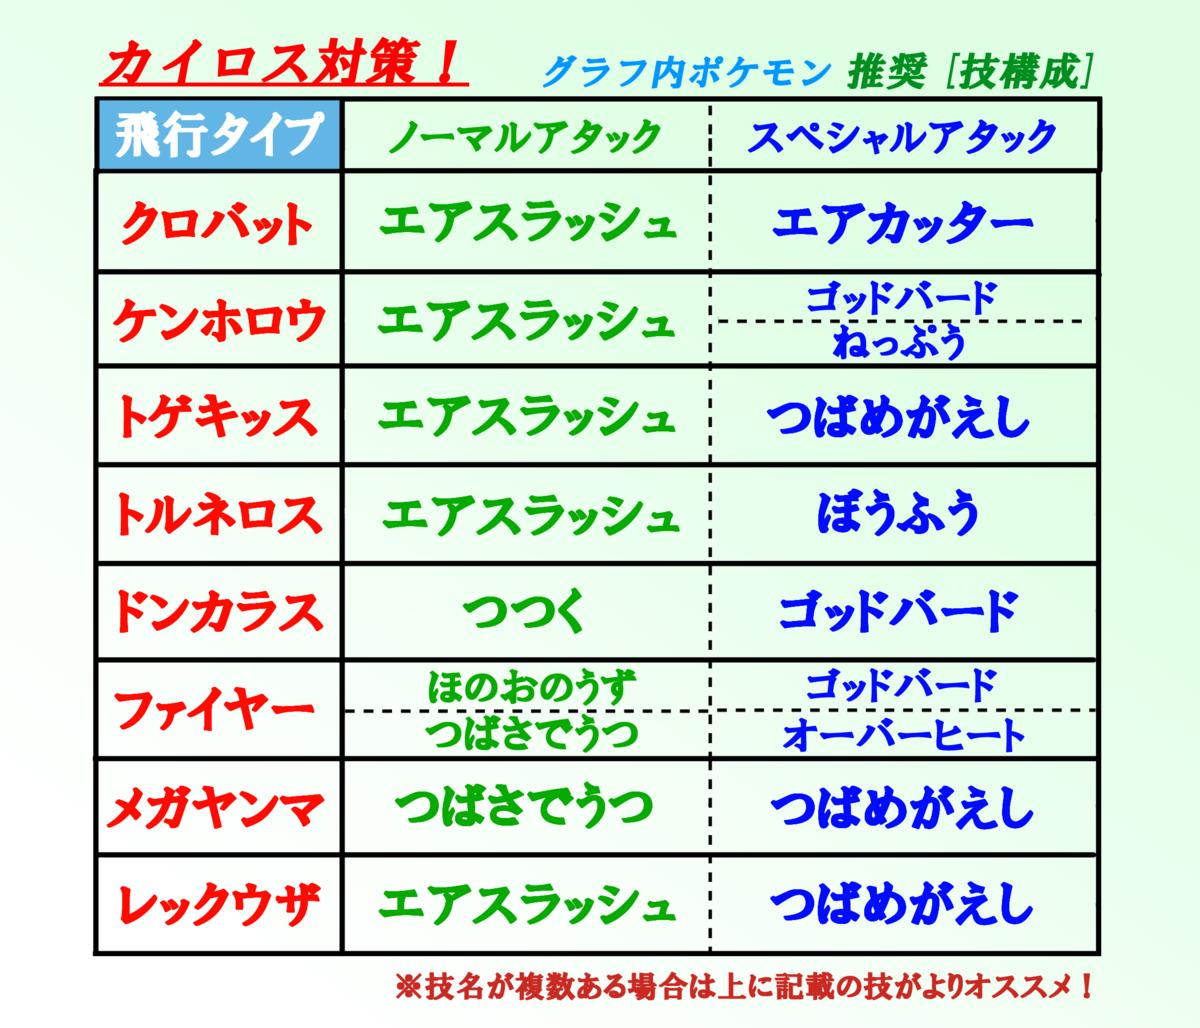 f:id:Kazumin0331:20200623121155p:plain